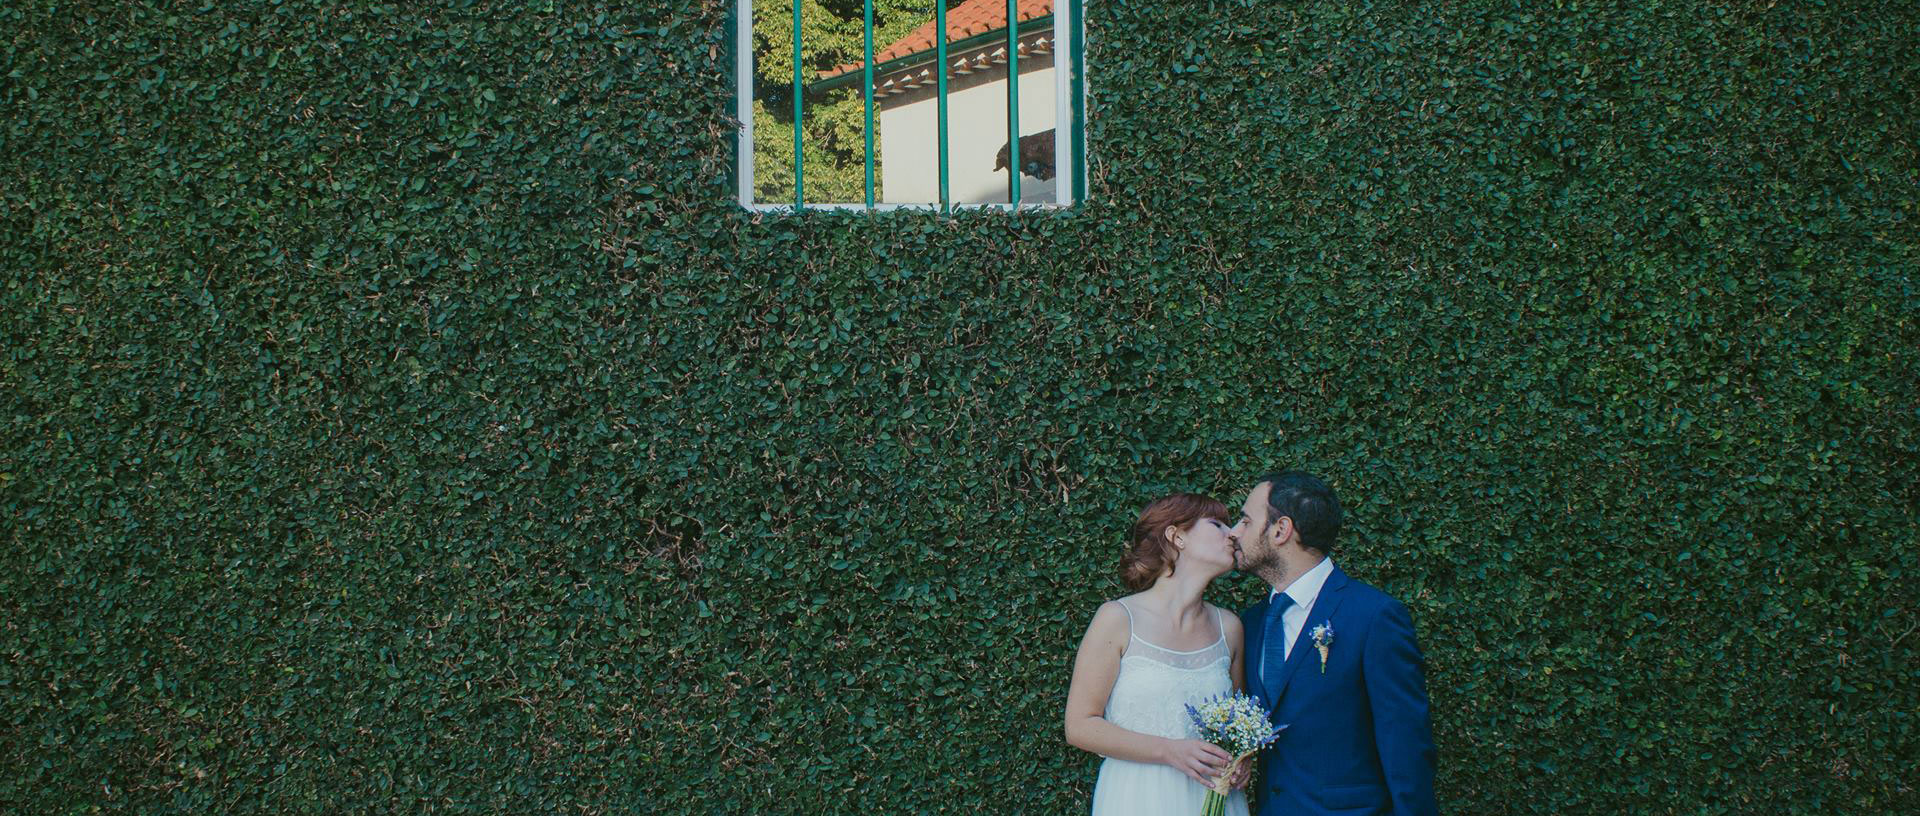 Rita & Luís - Wedding